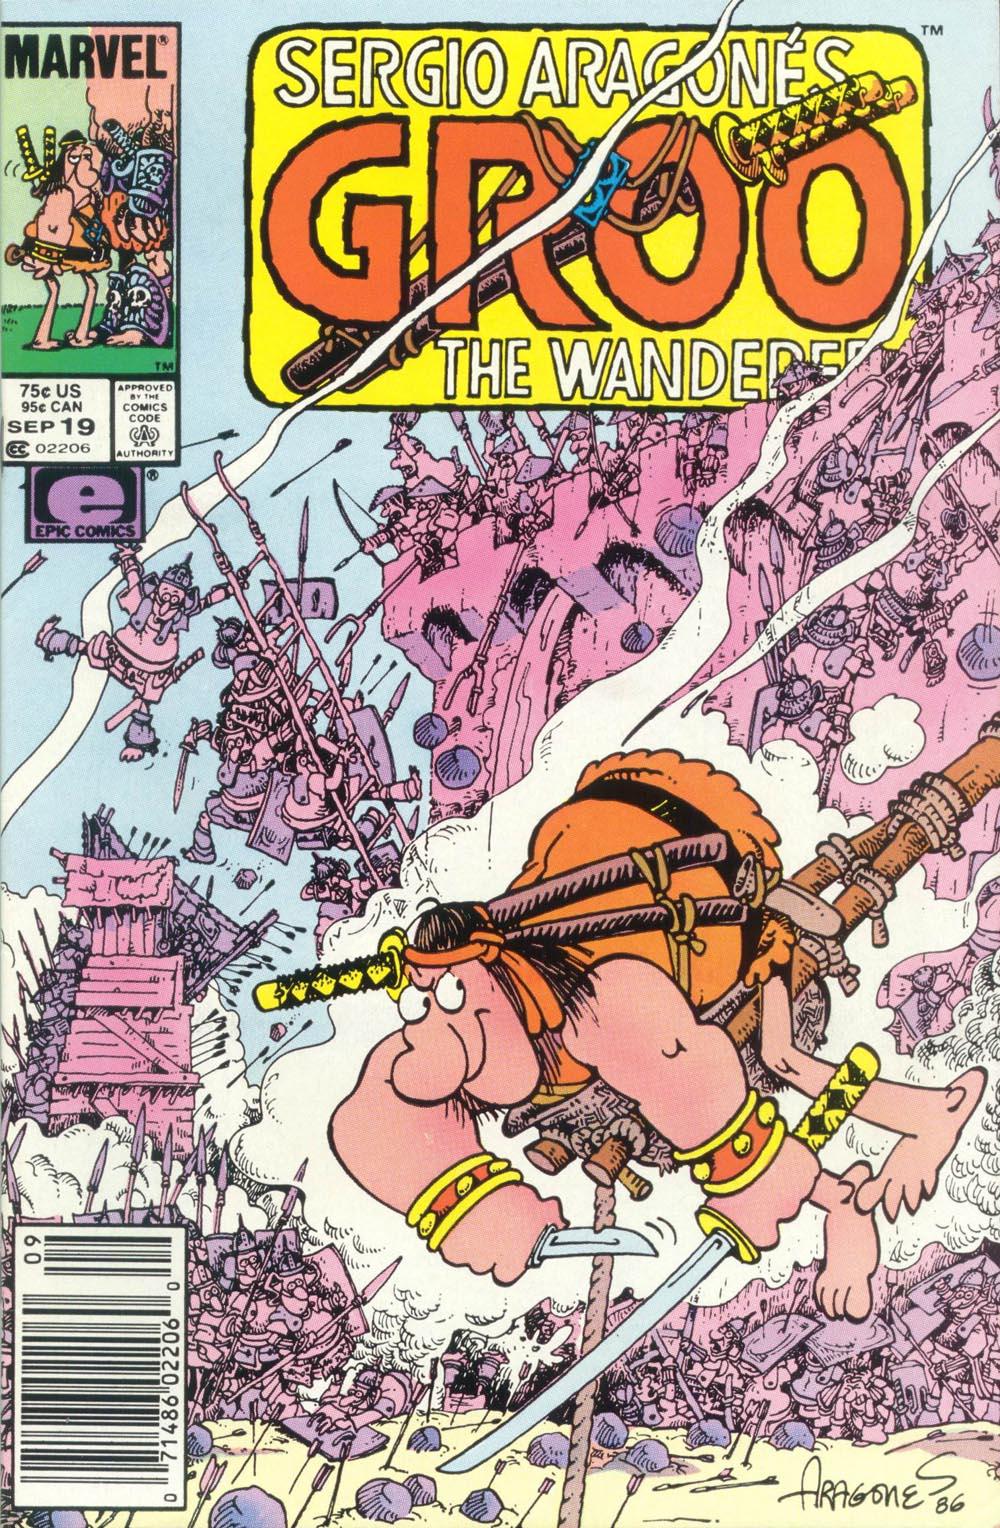 Read online Sergio Aragonés Groo the Wanderer comic -  Issue #19 - 1